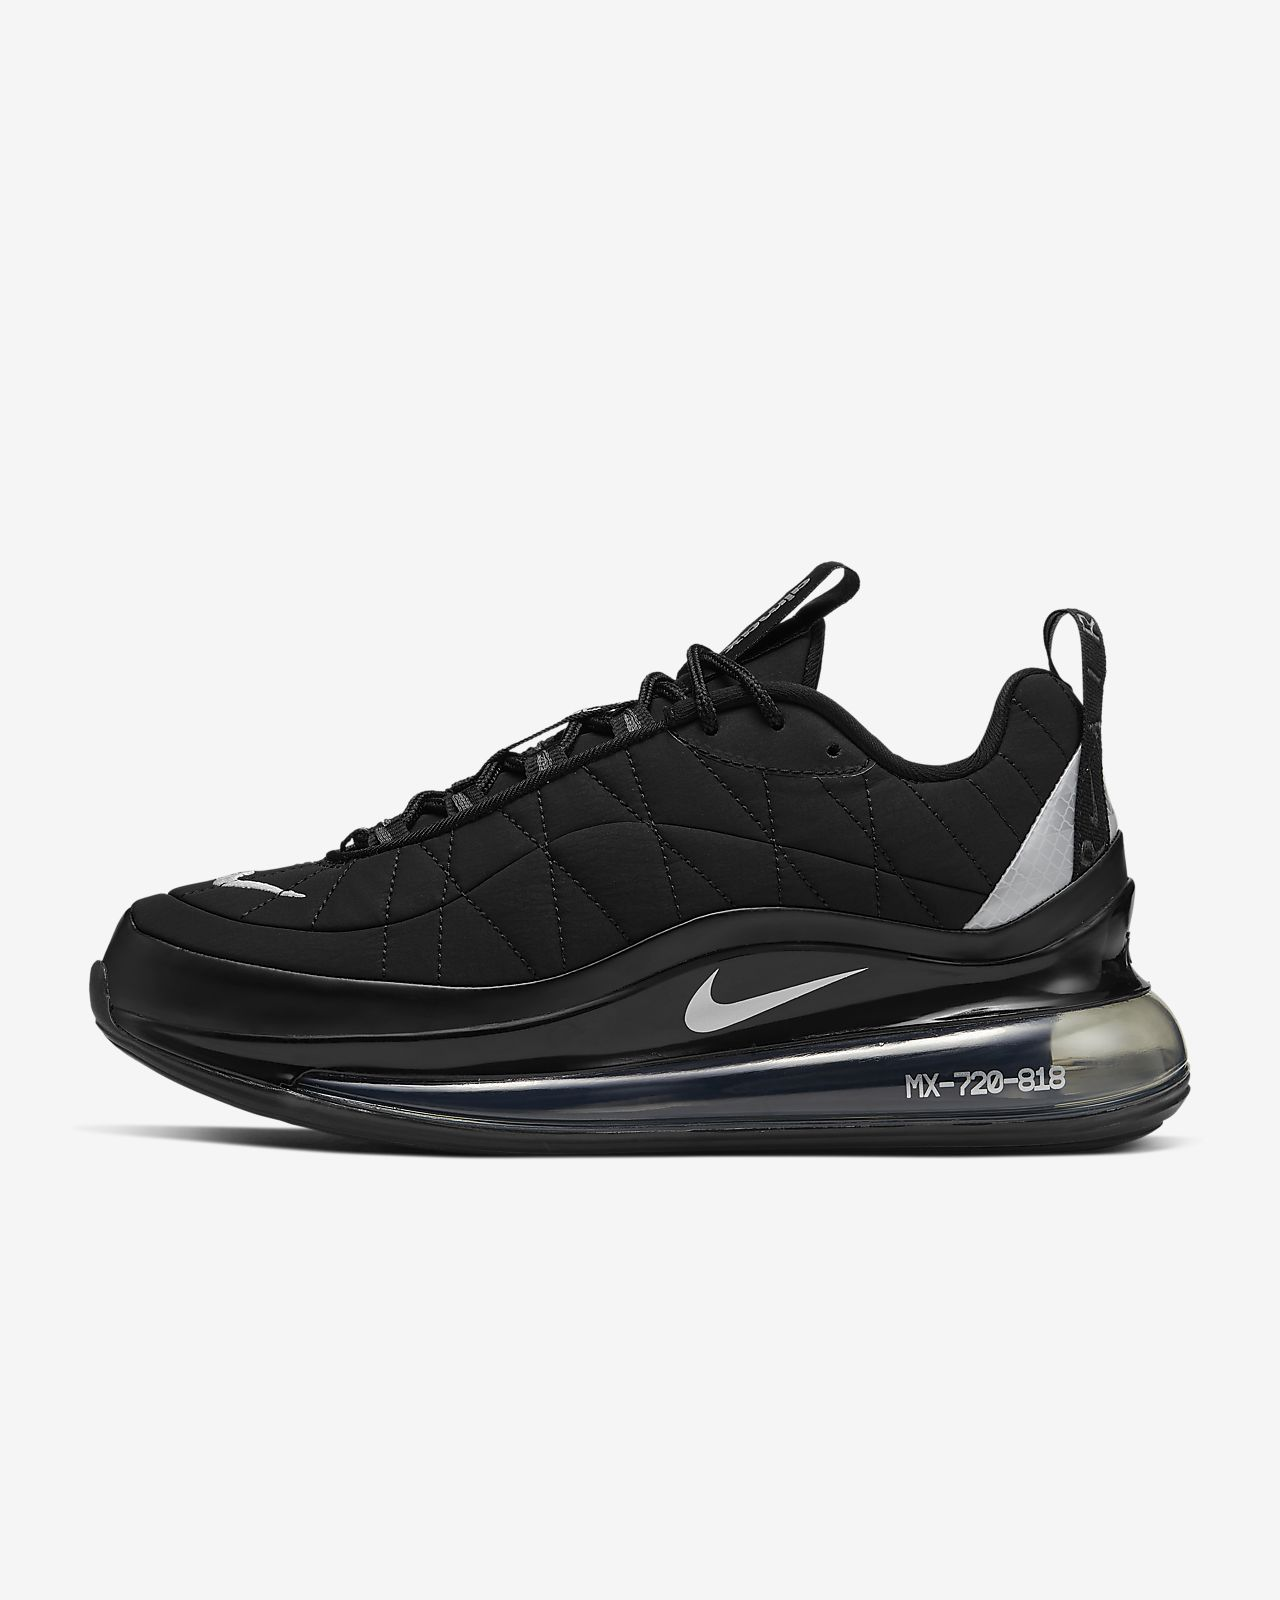 Scarpa Nike MX-720-818 - Donna